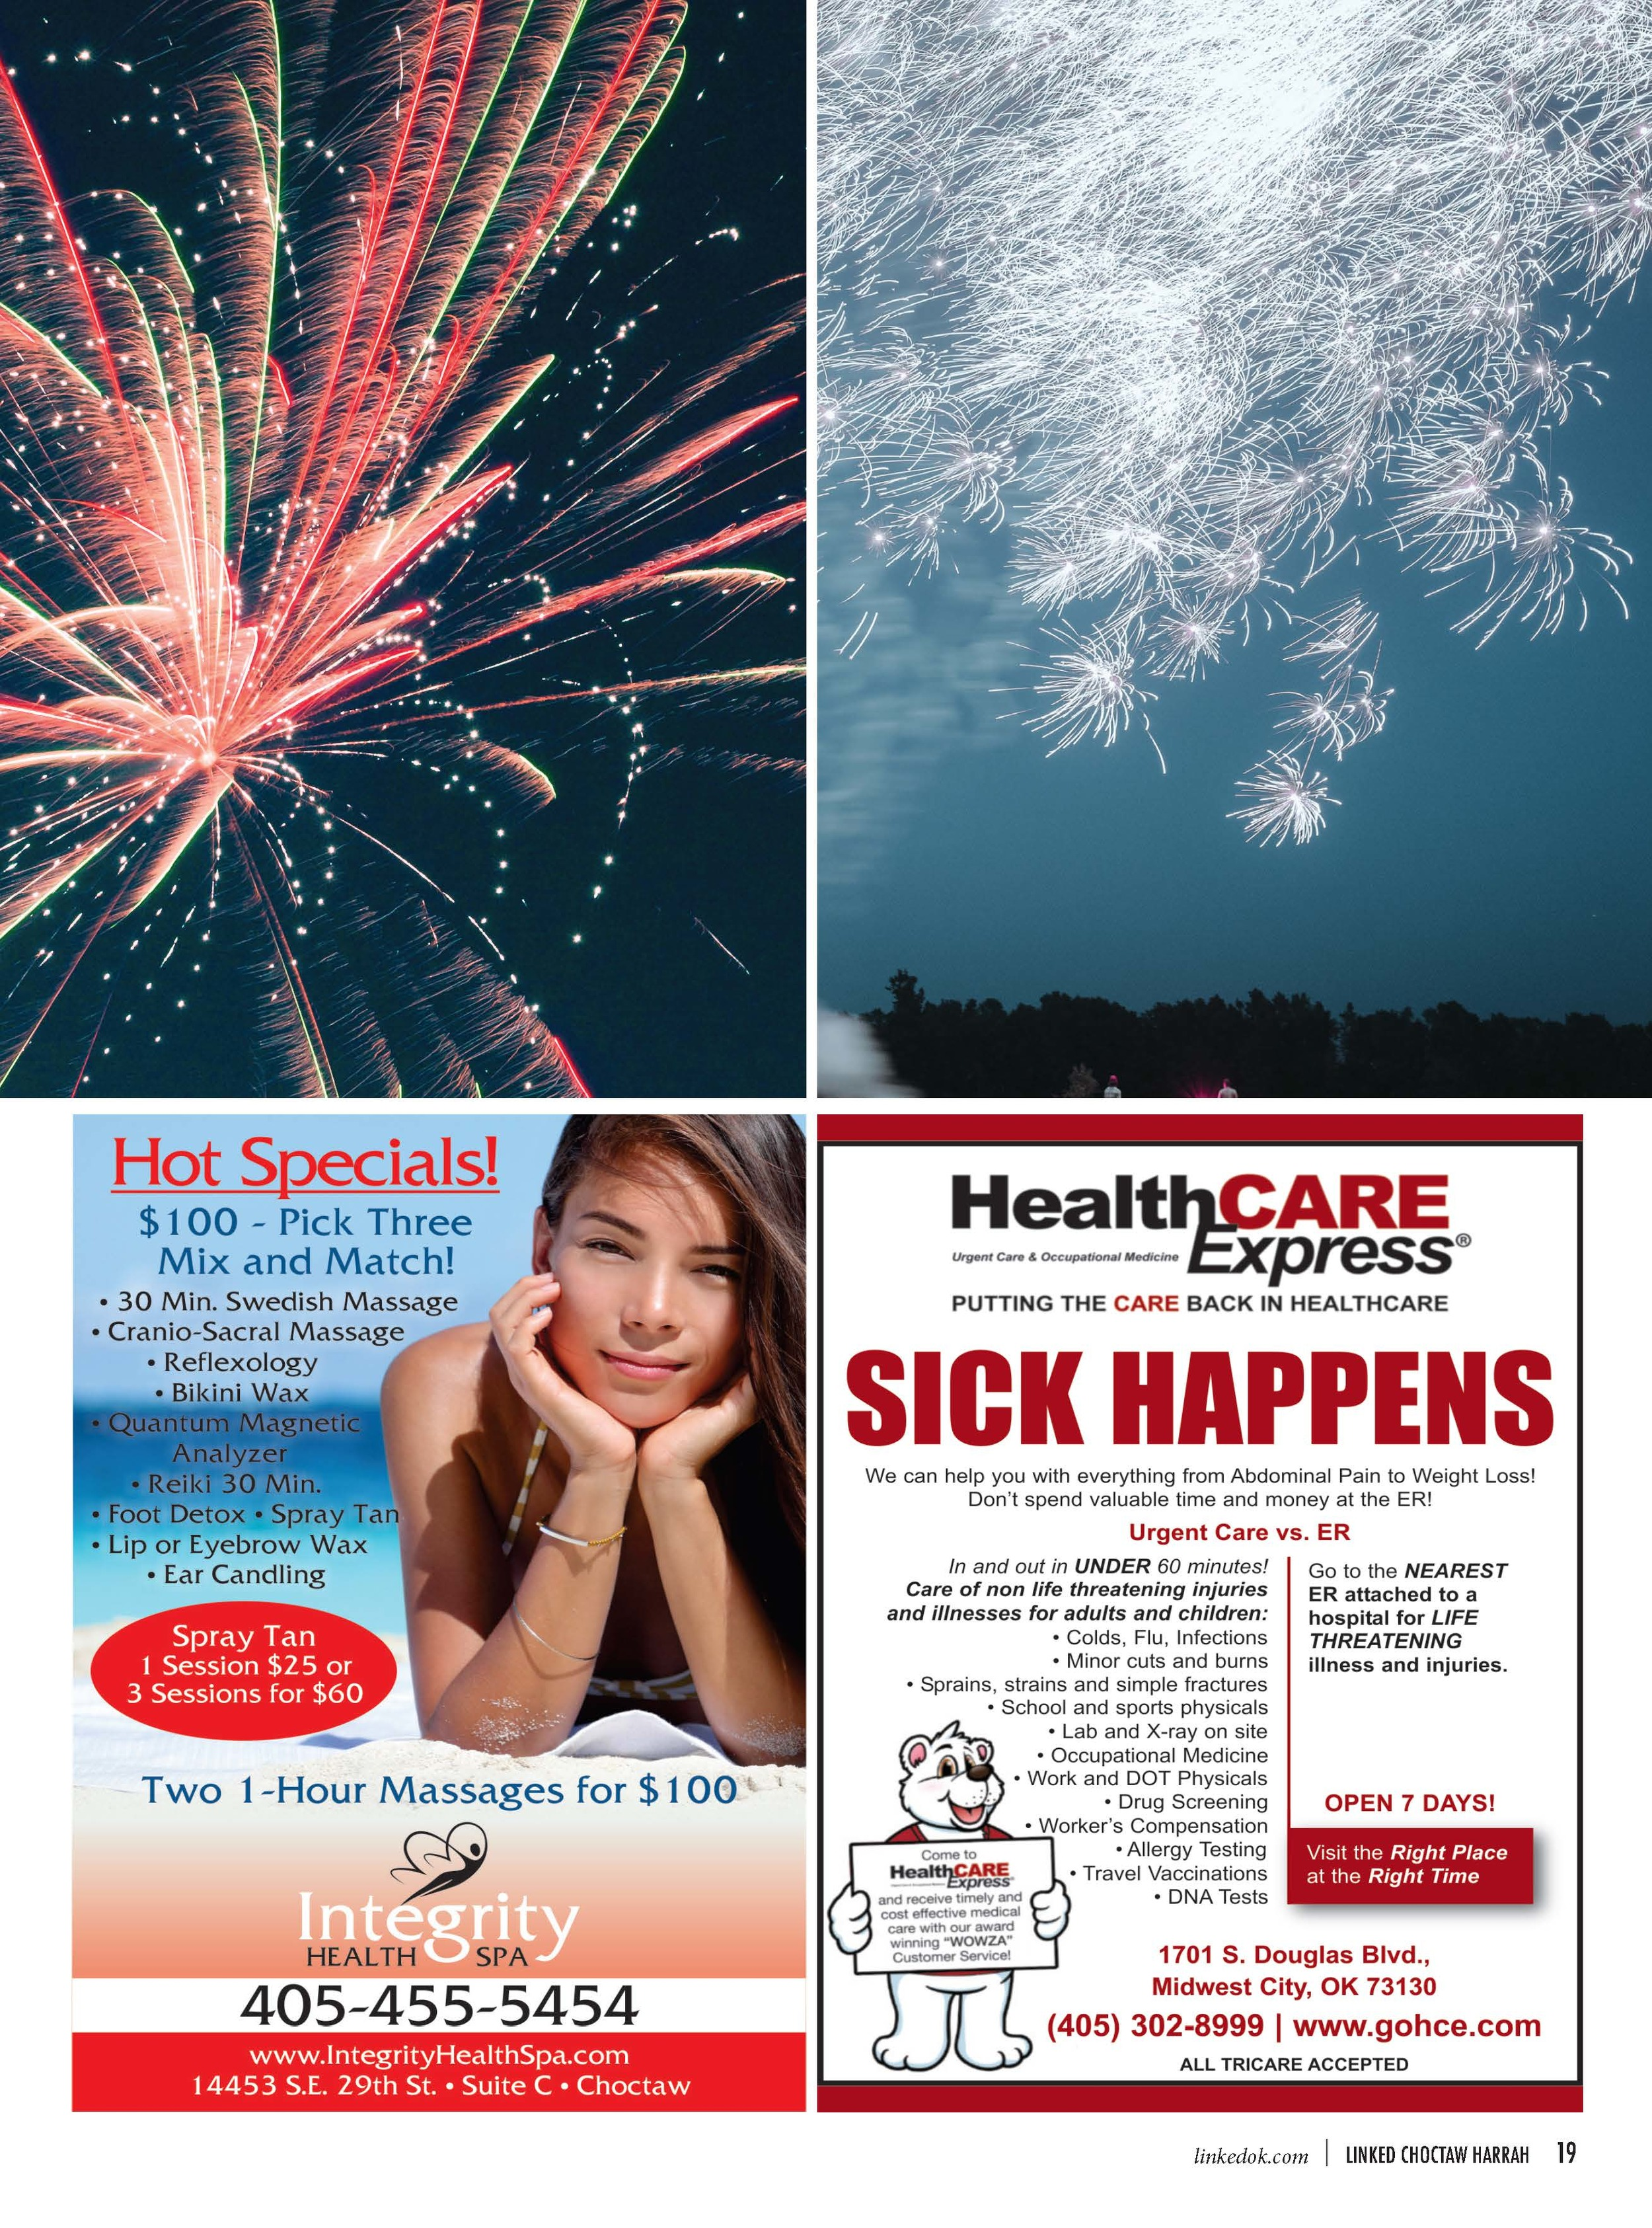 HighFive_ChoctawHarrah_June 2016 REVISED_Page_19.jpg